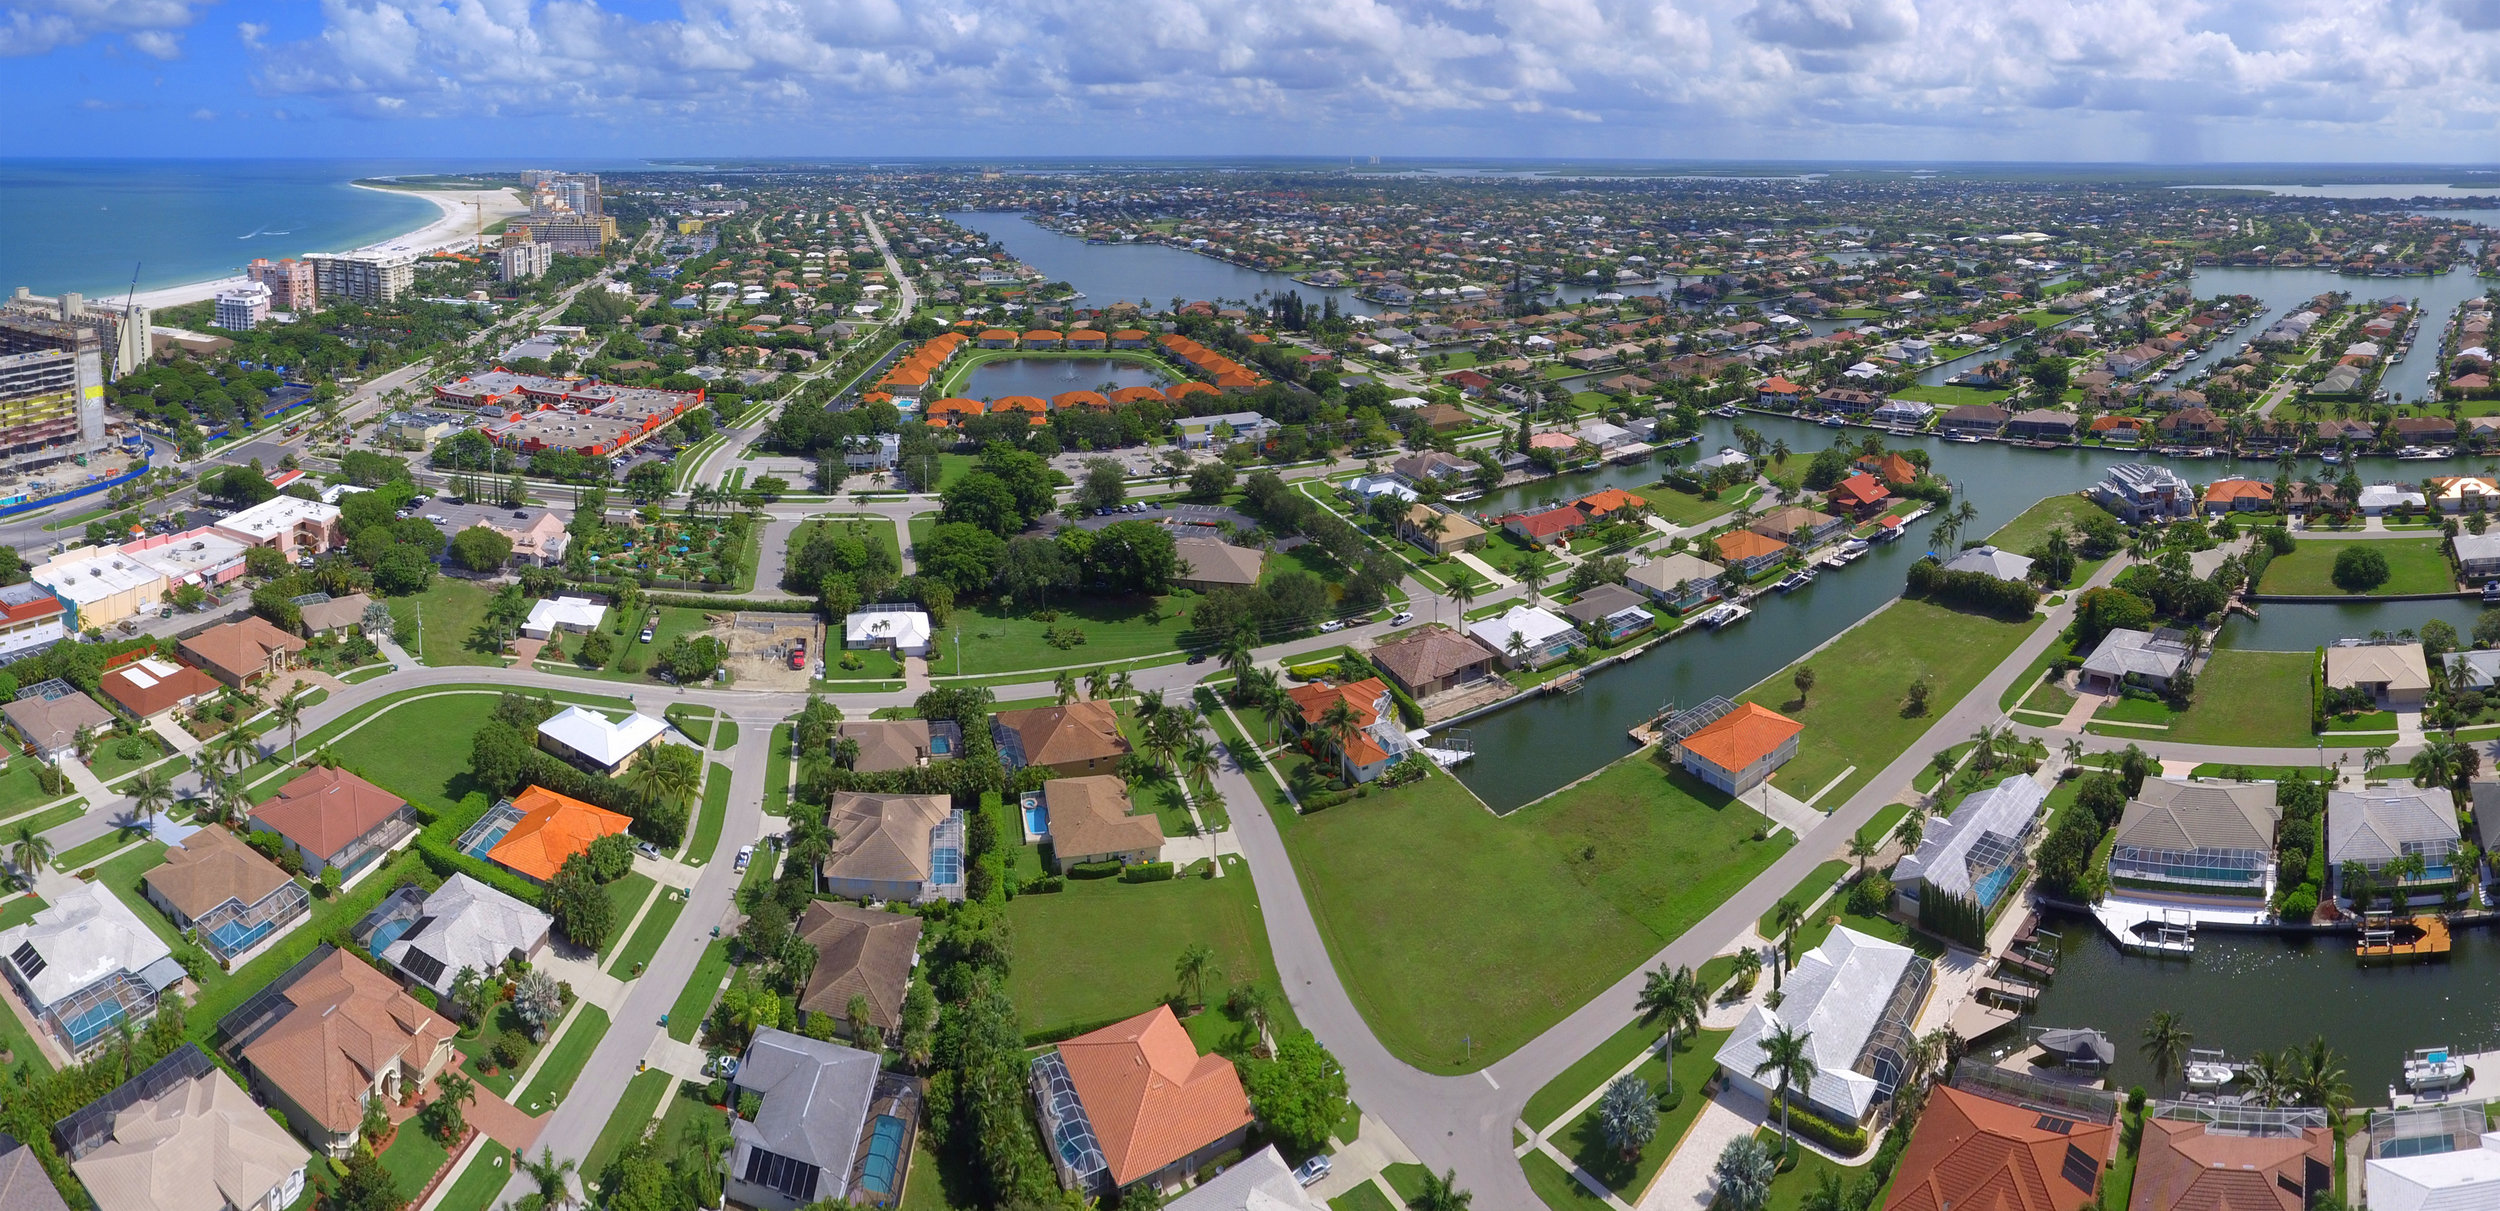 Joe-the-Home-Pro-Marco-Island-Florida-Homes-Overview-photo